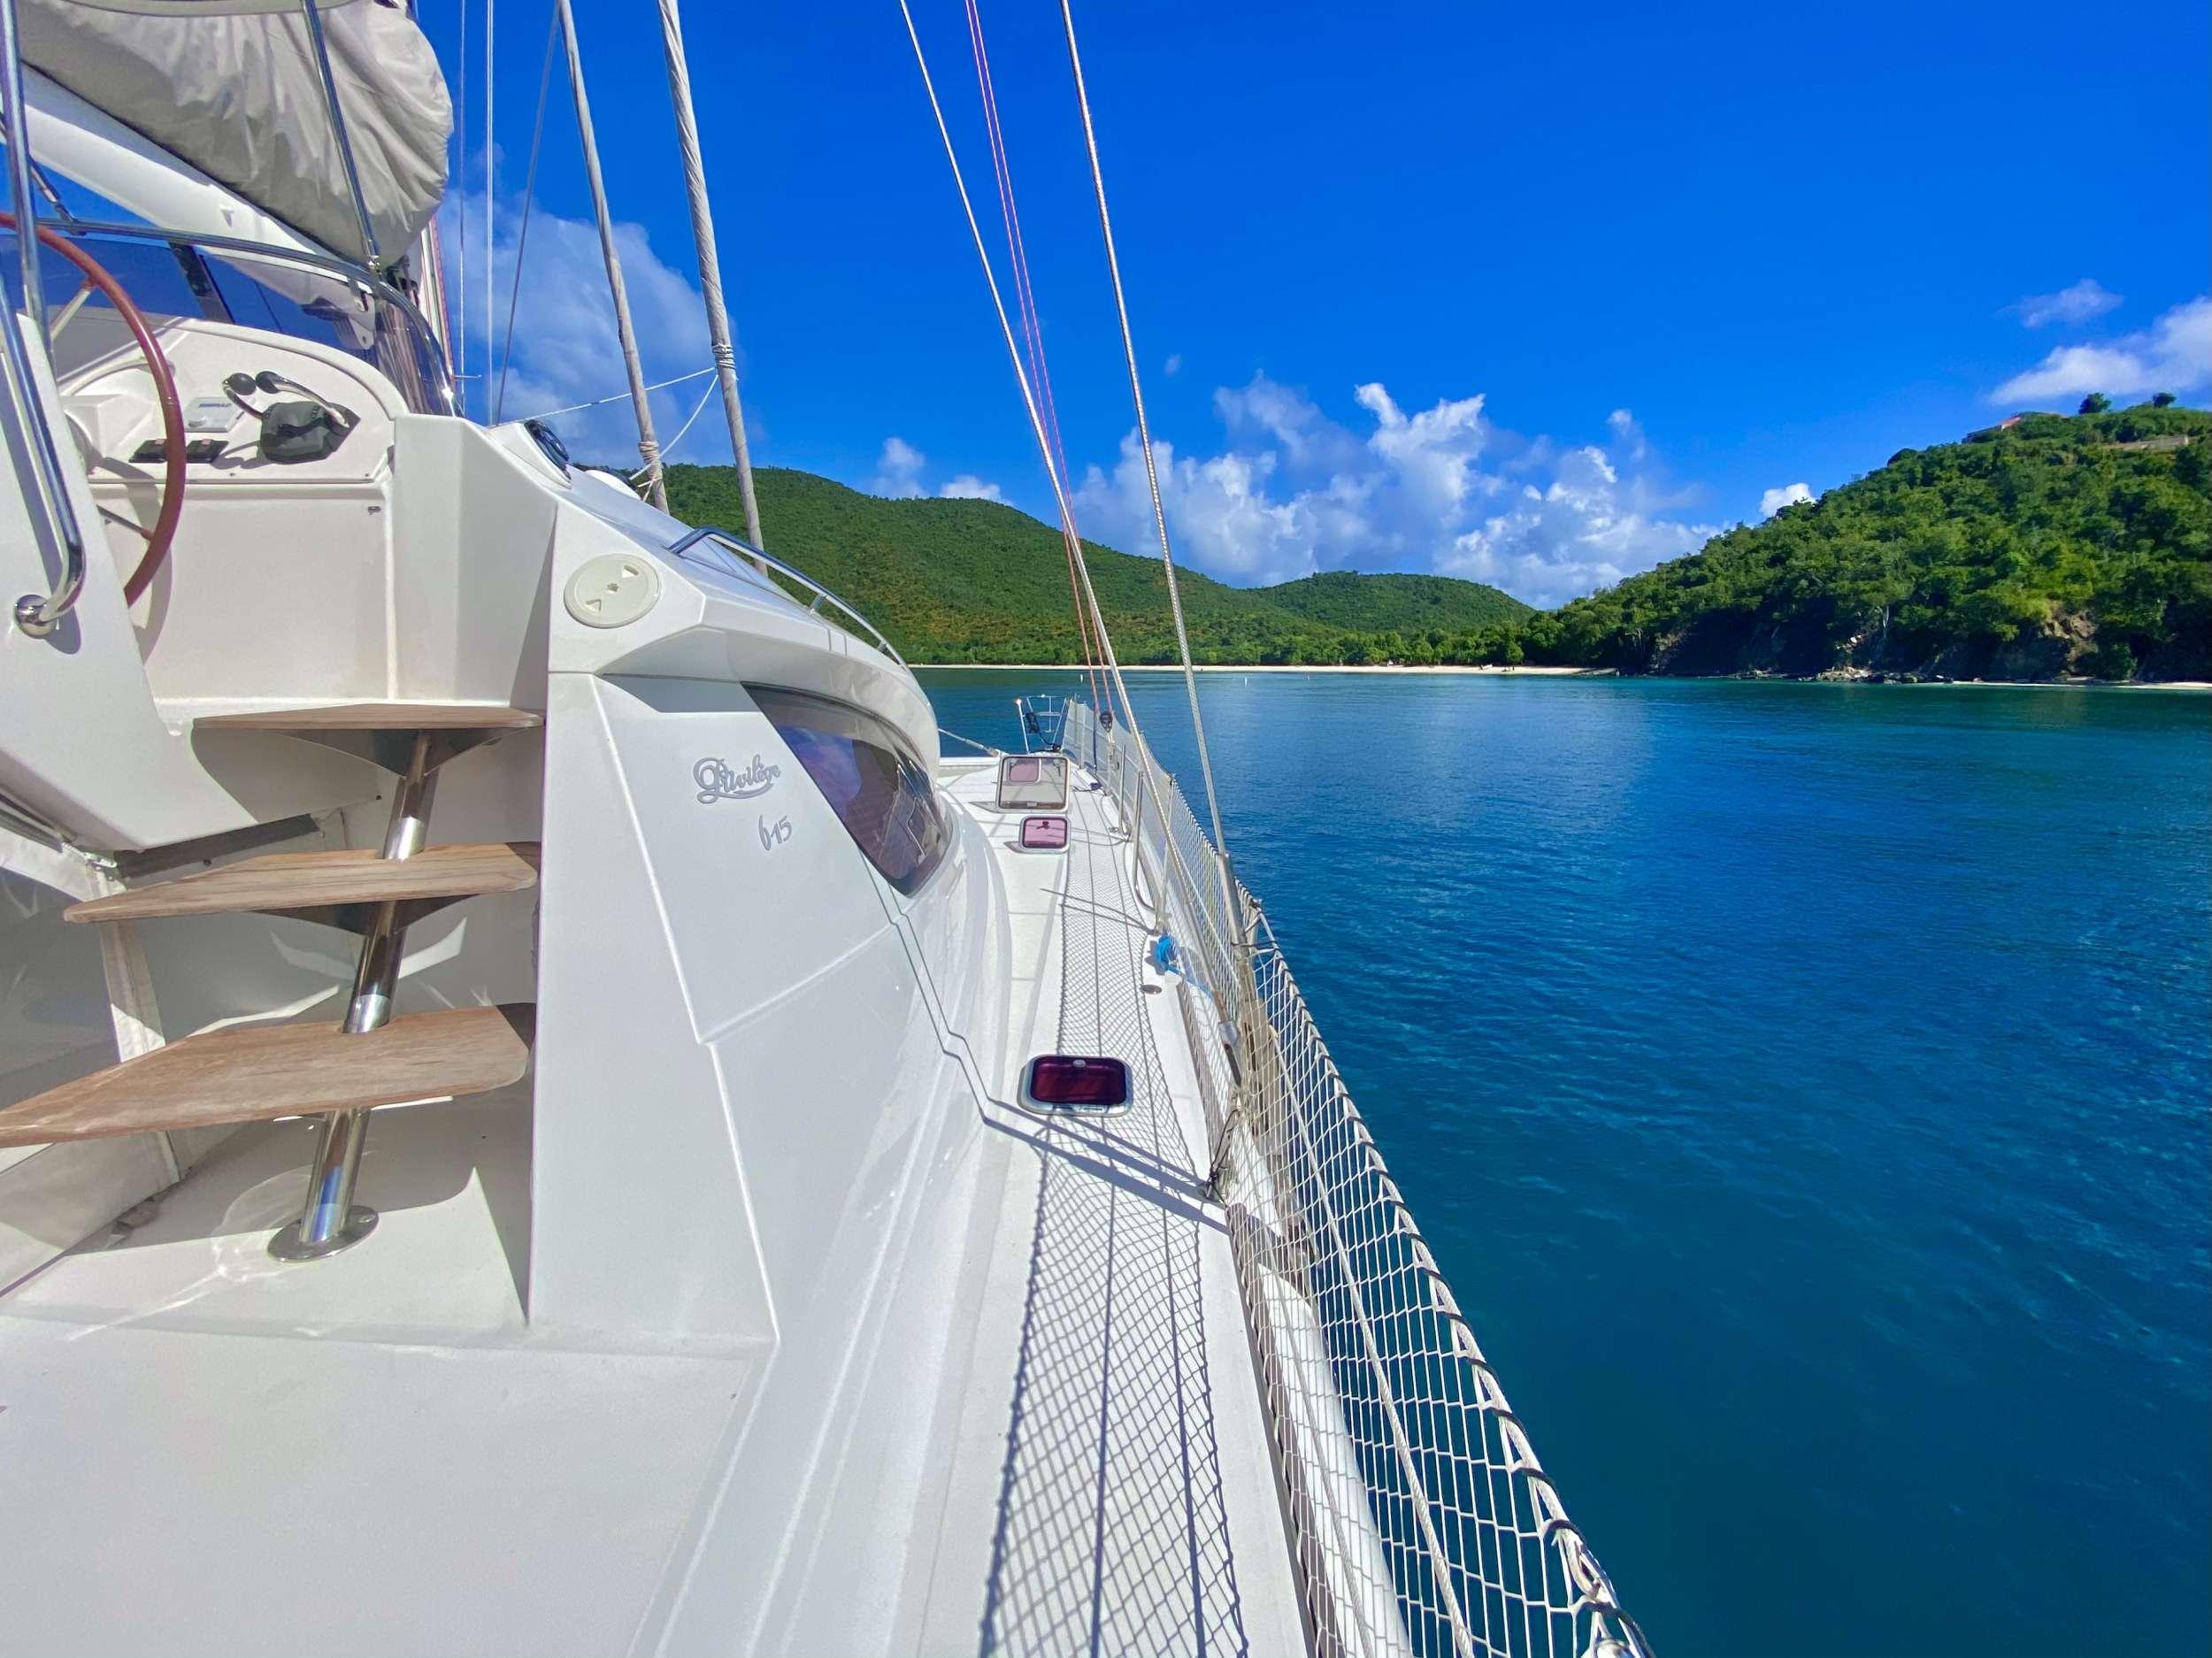 TRES SUENOS yacht image # 13